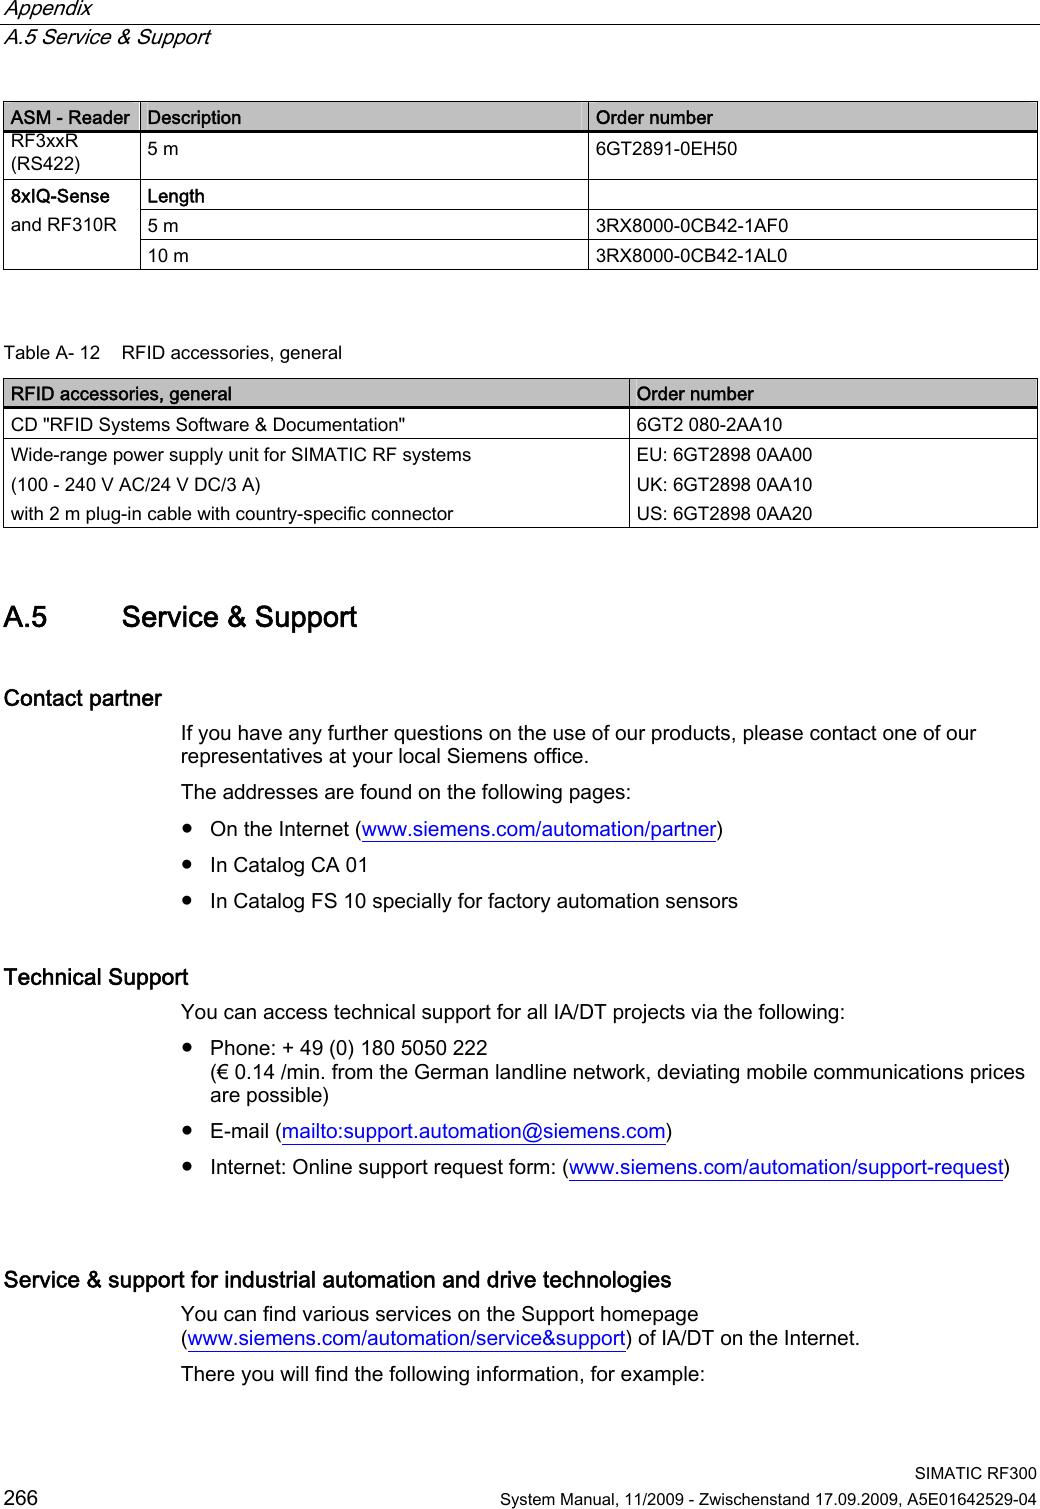 Siemens RF350R01 RFID System User Manual SIMATIC RF300